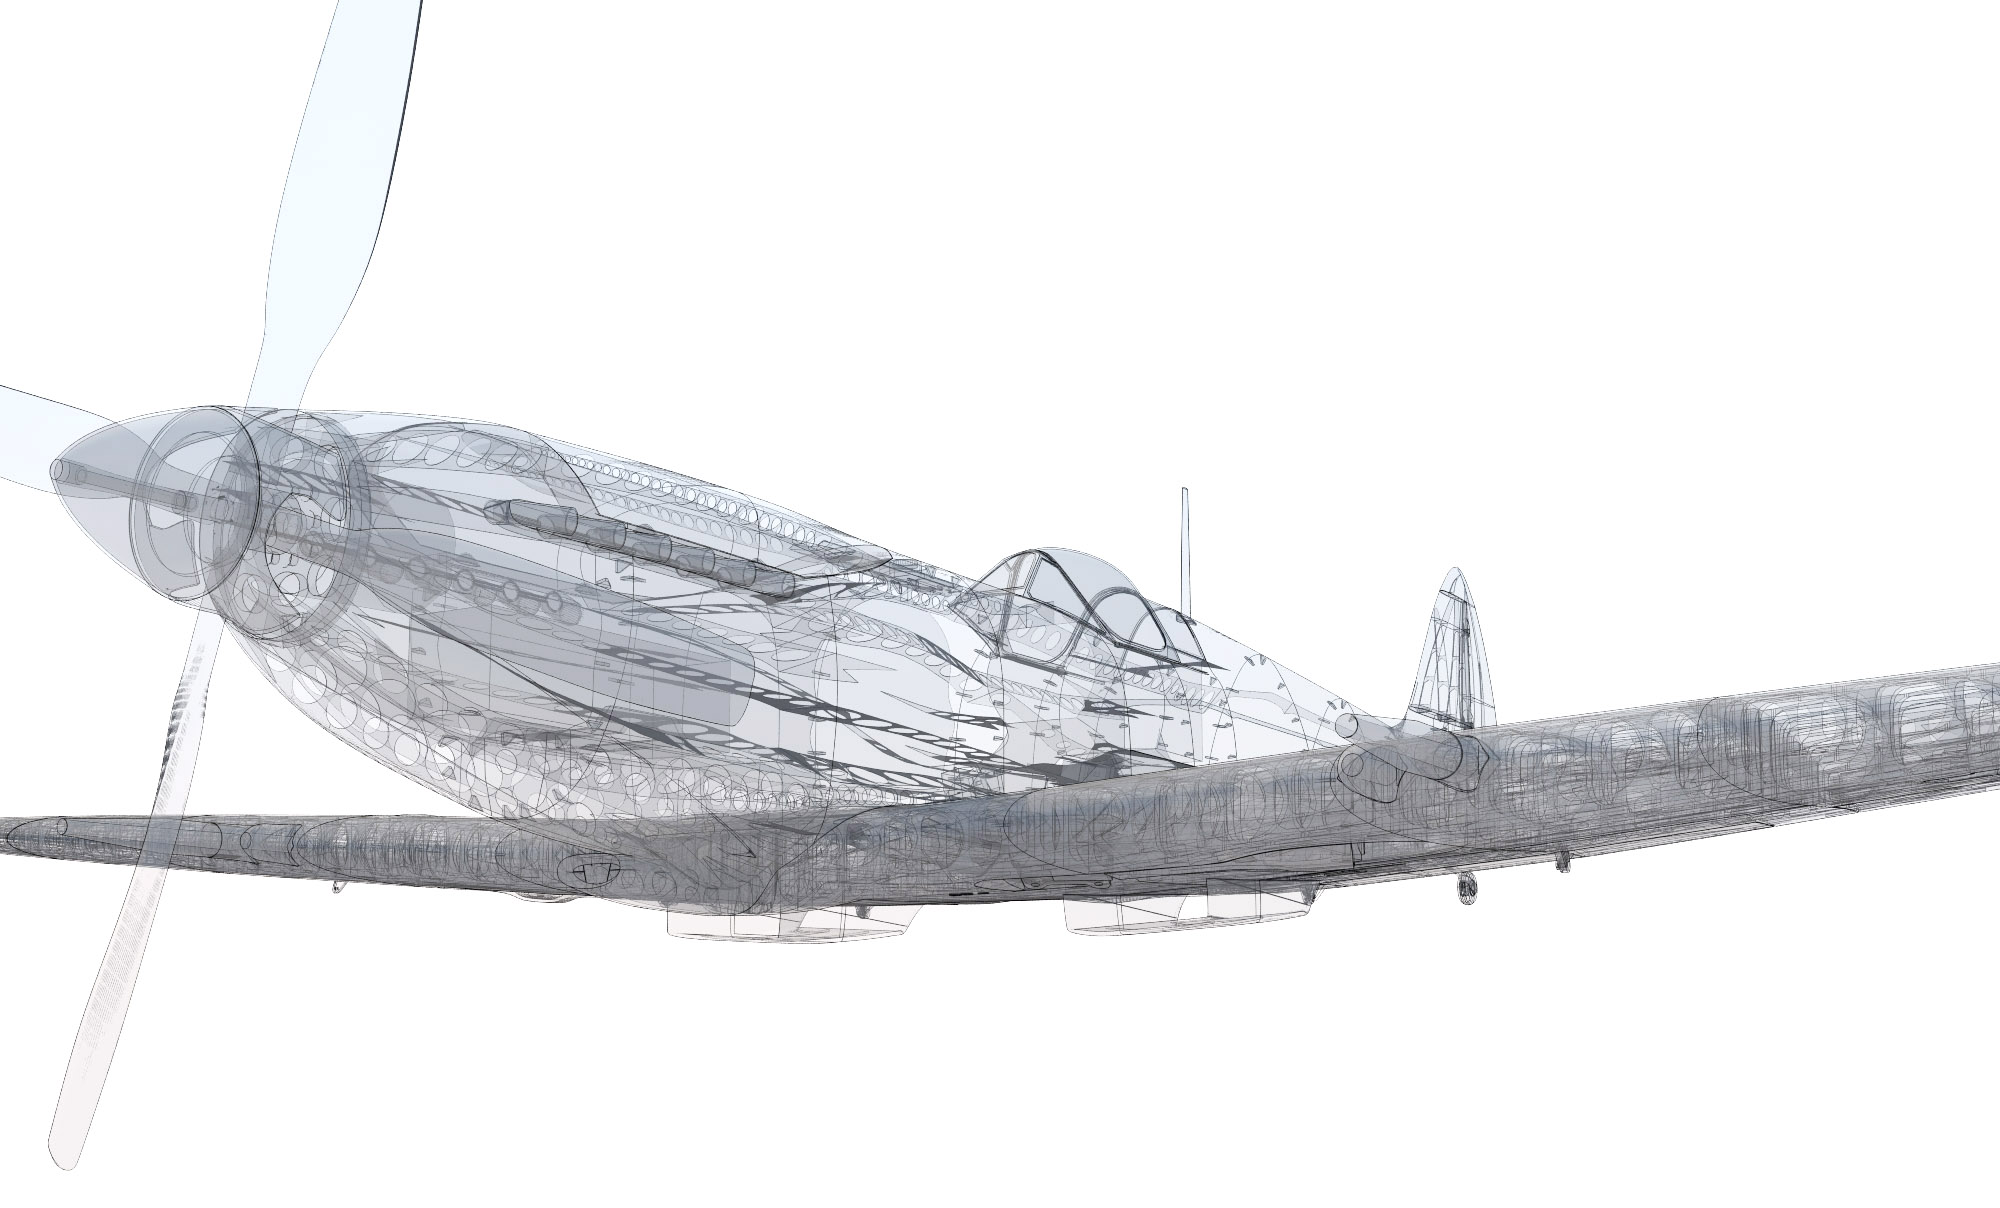 spitfire_MkIX_pers_03